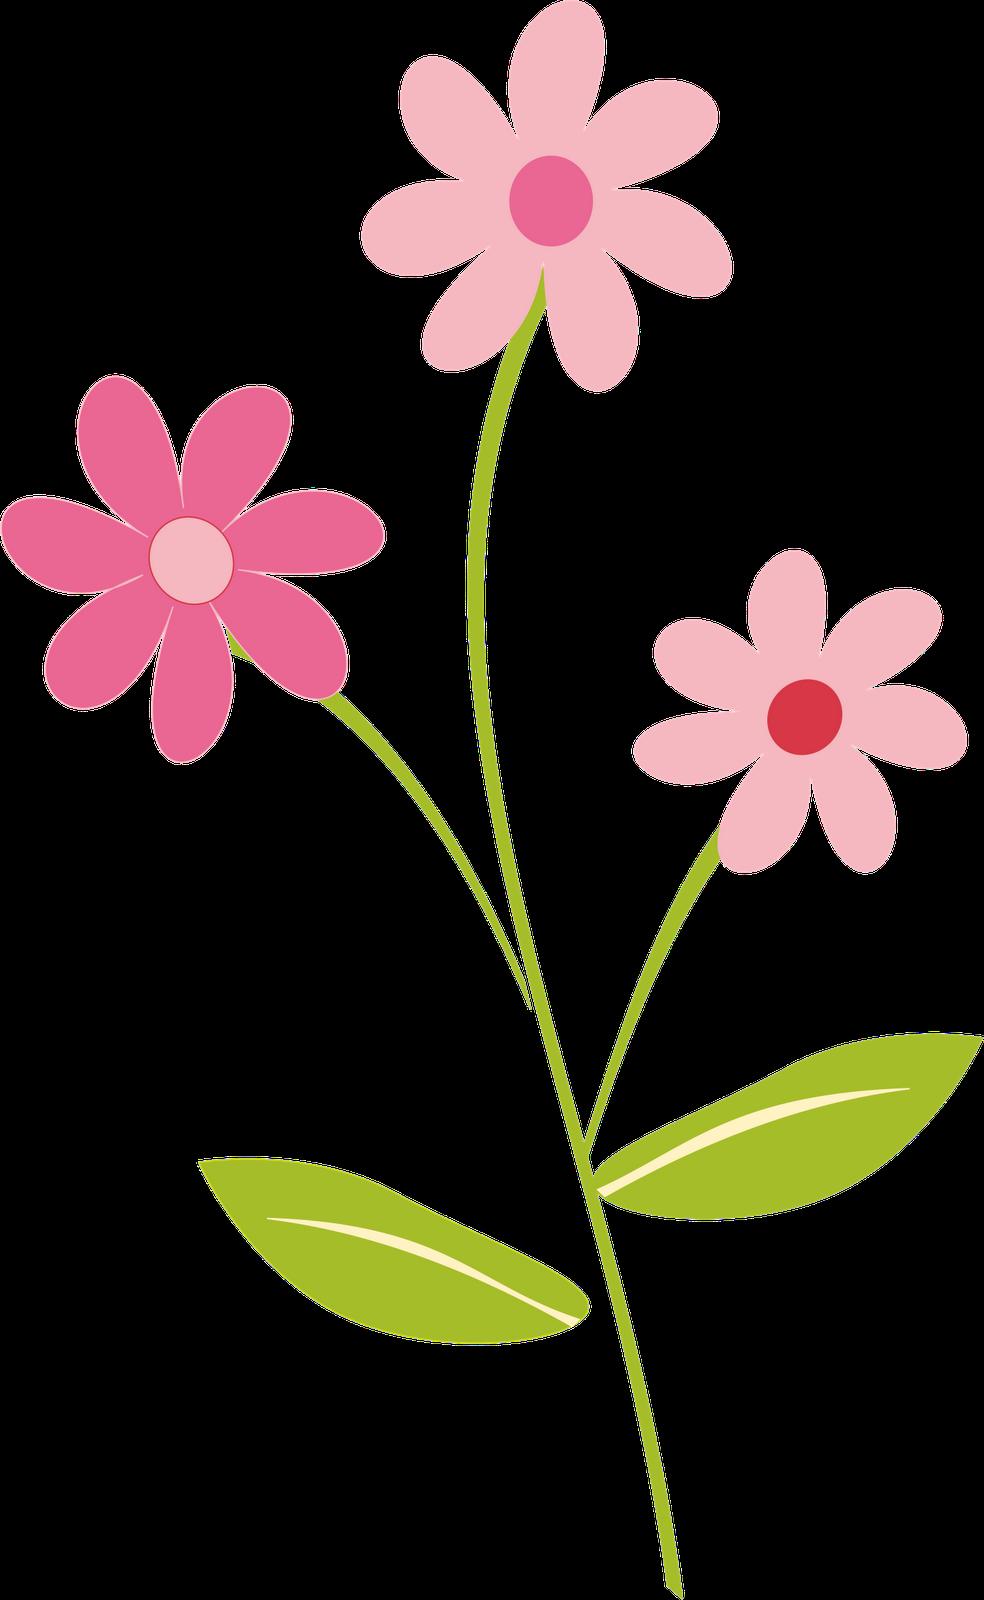 984x1600 Flower Clip Art Images Free